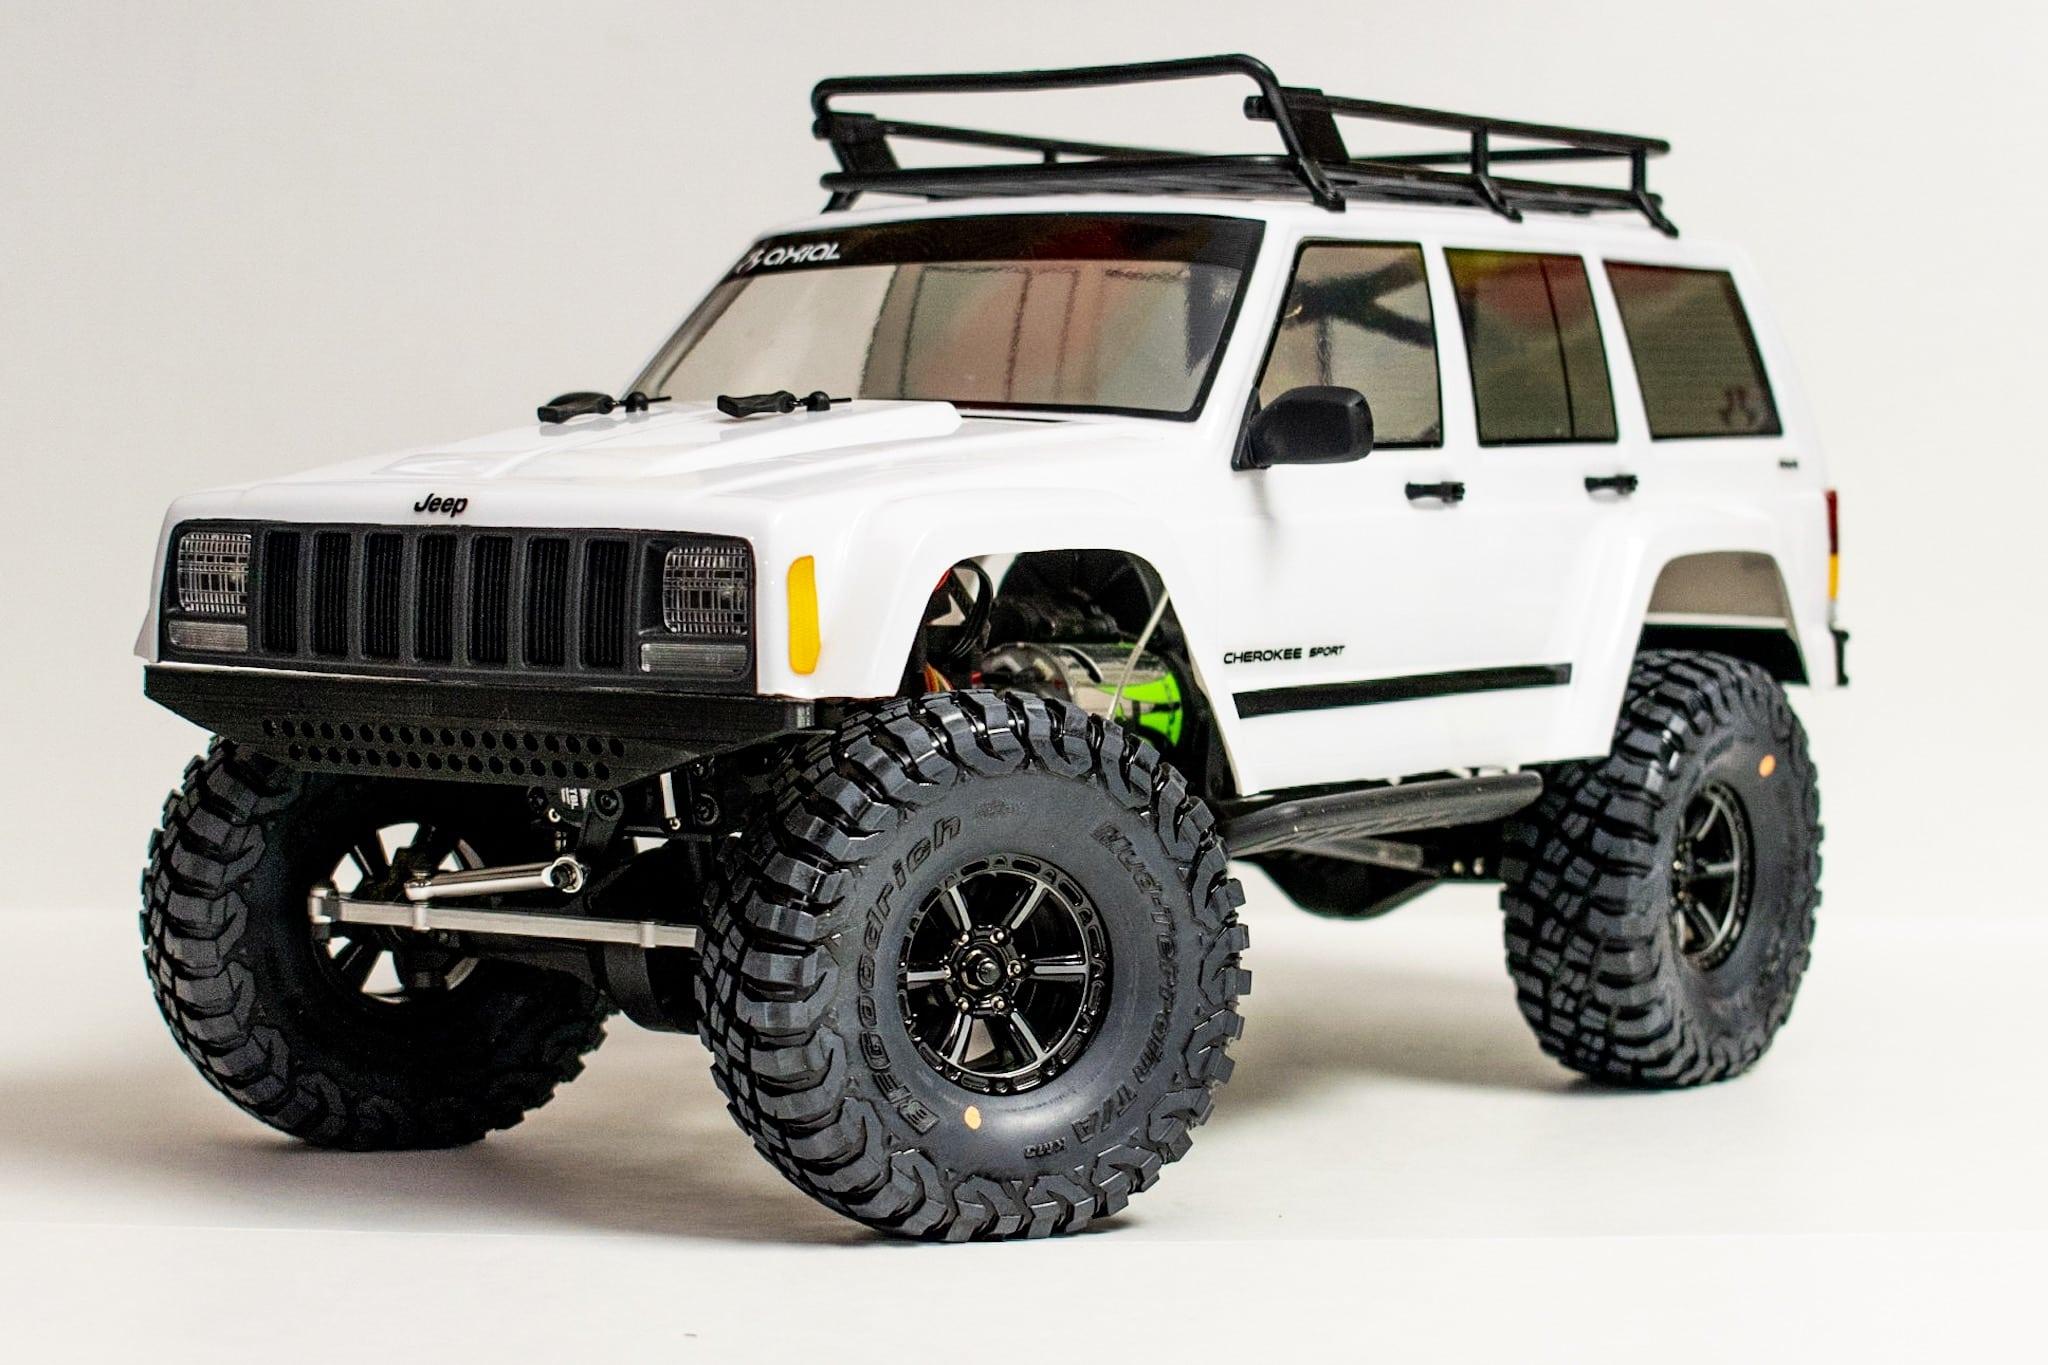 Hands-on with Pro-Line's BFGoodrich KM3 1.9″ G8 Rock Terrain Tires